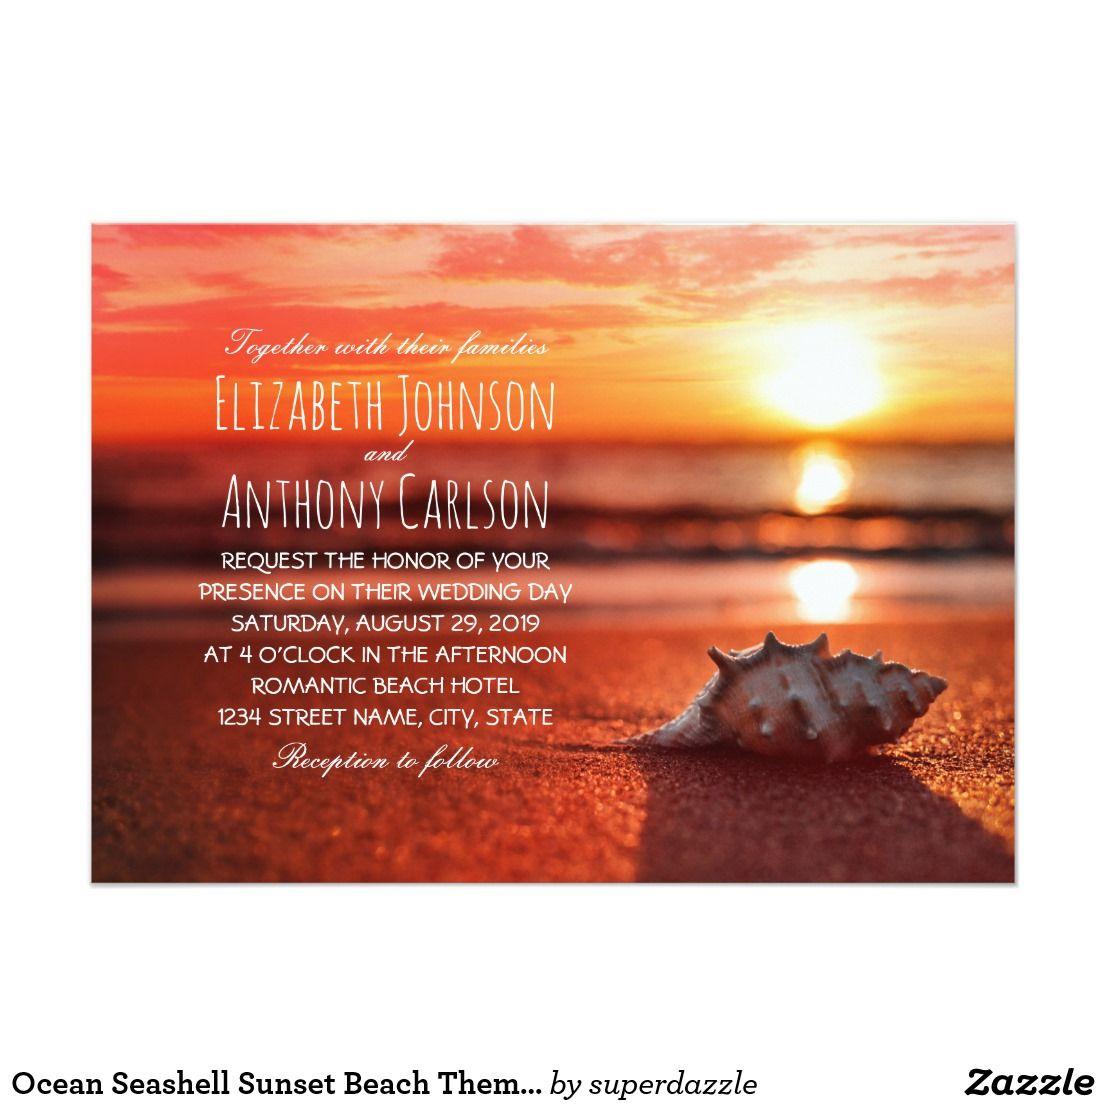 Sunset Beach Wedding Ideas: Ocean Seashell Sunset Beach Themed Wedding Invitation